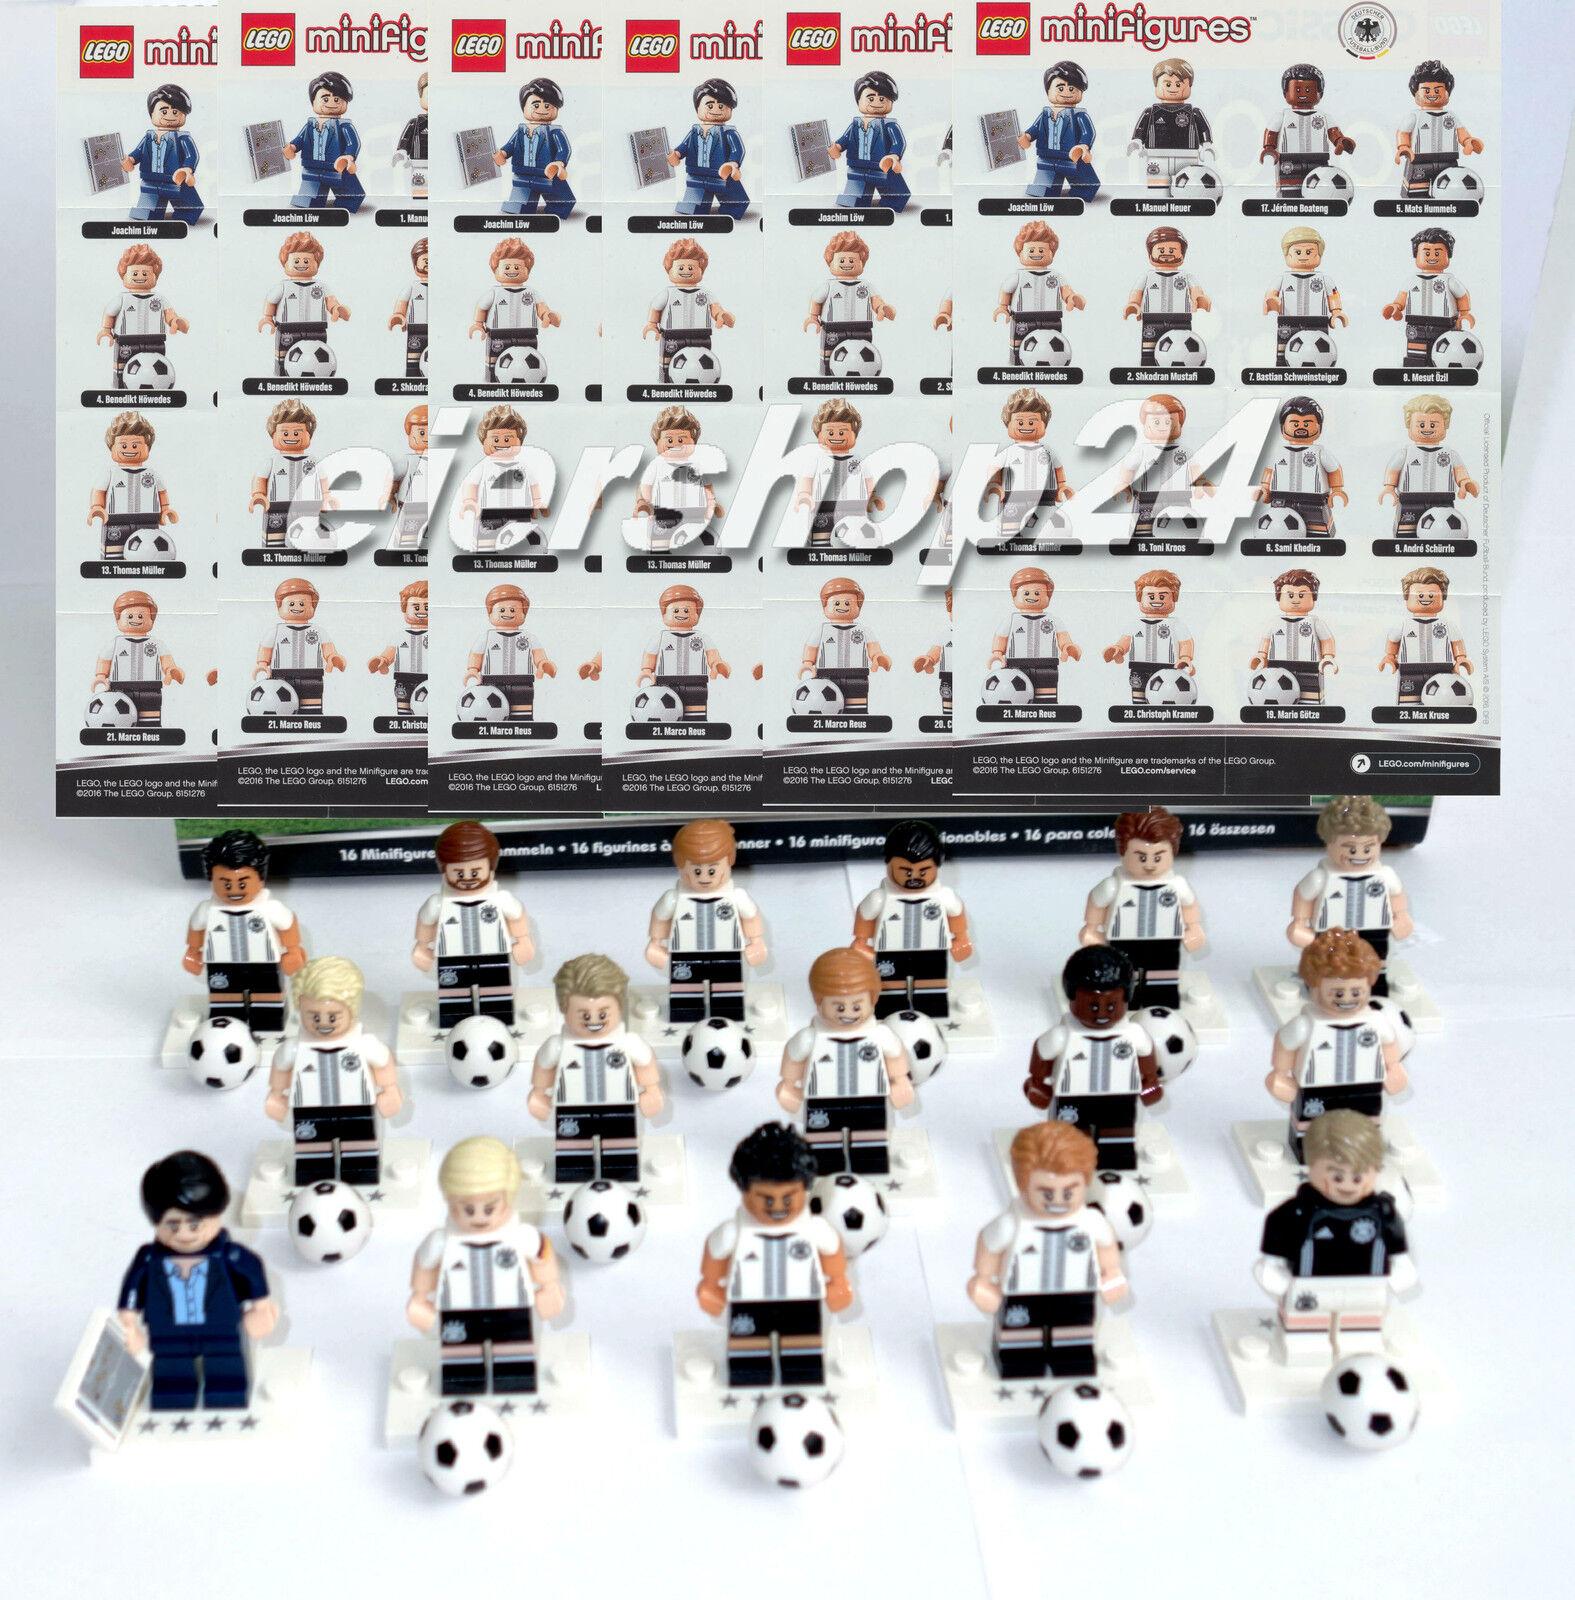 Kompletter Satz Lego 174 Minifiguren 71014 Dfb Die